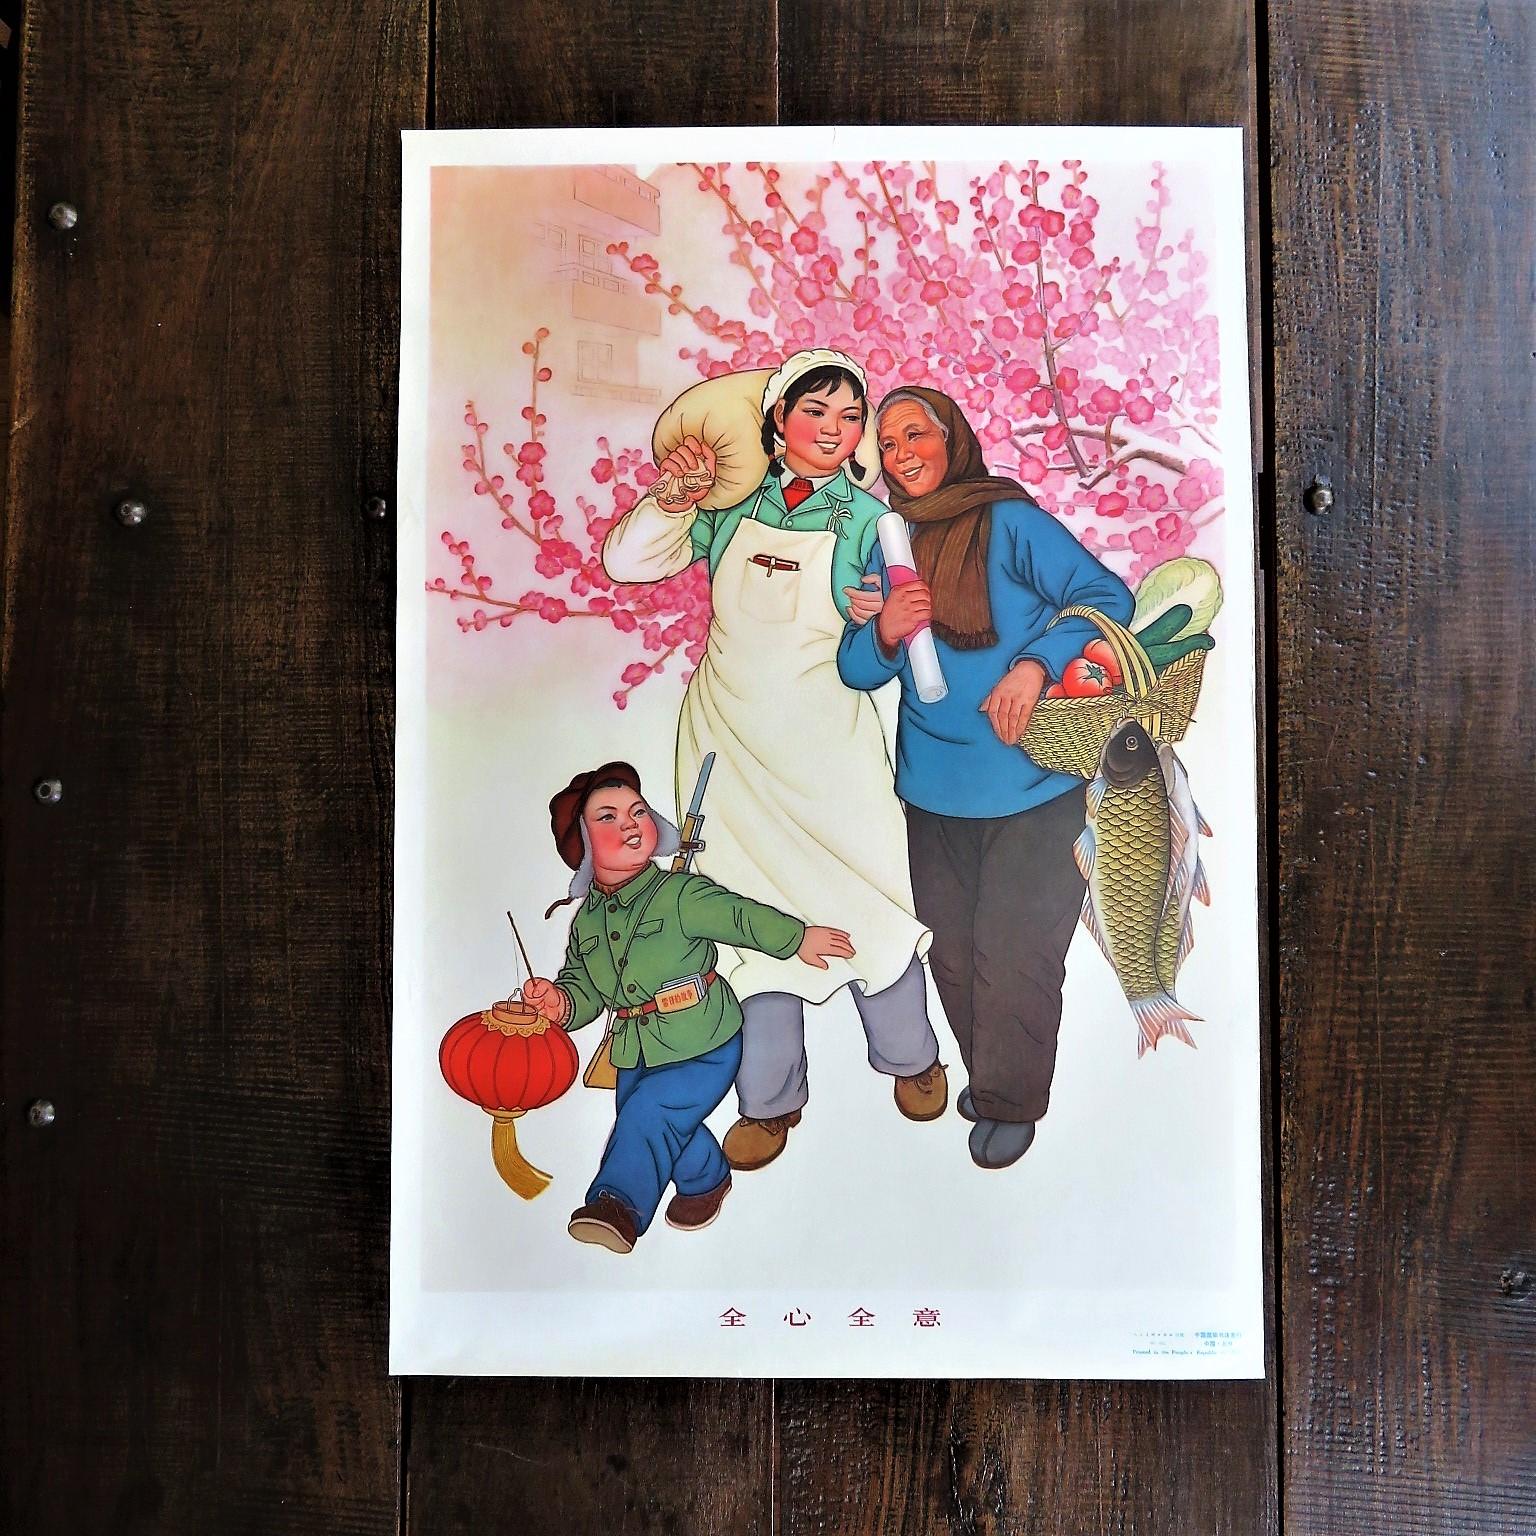 poster-cultural-revolution-china-1-1